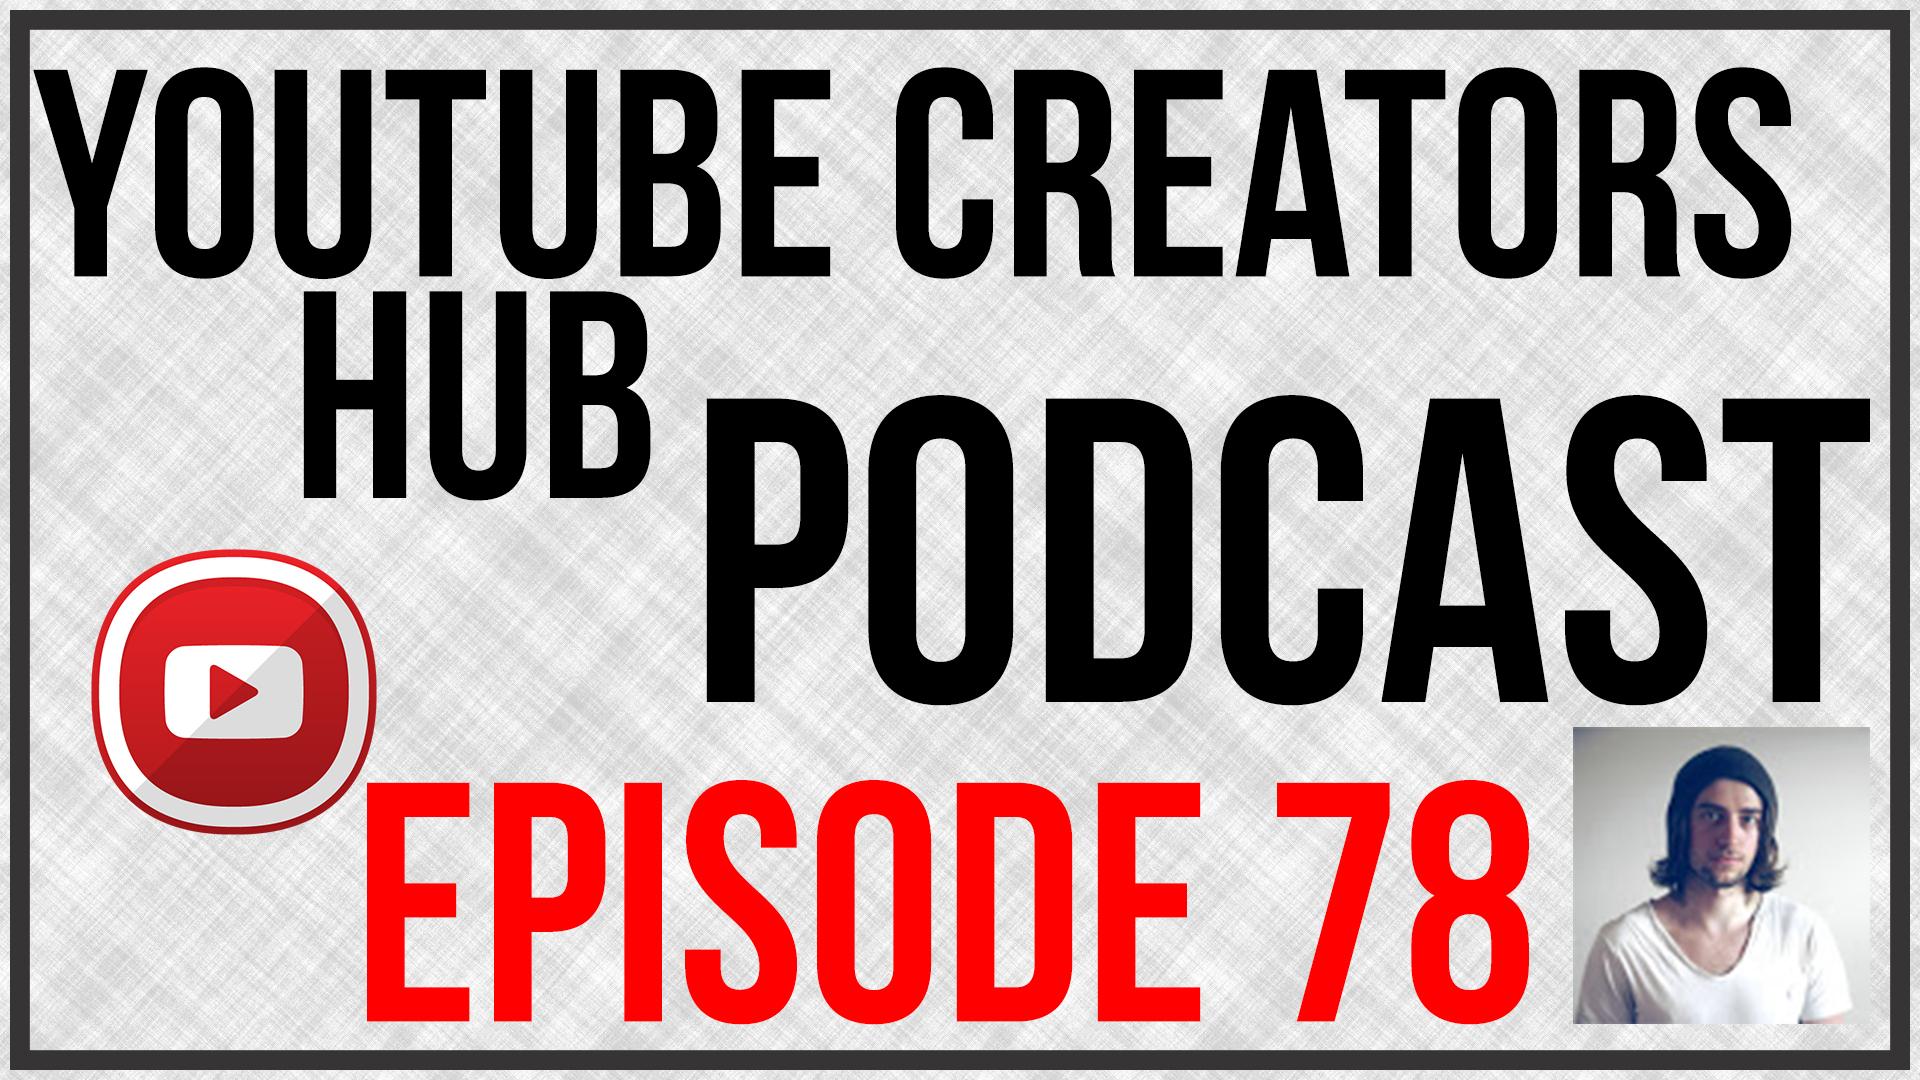 YouTube Creators Hub Podcast Episode 78